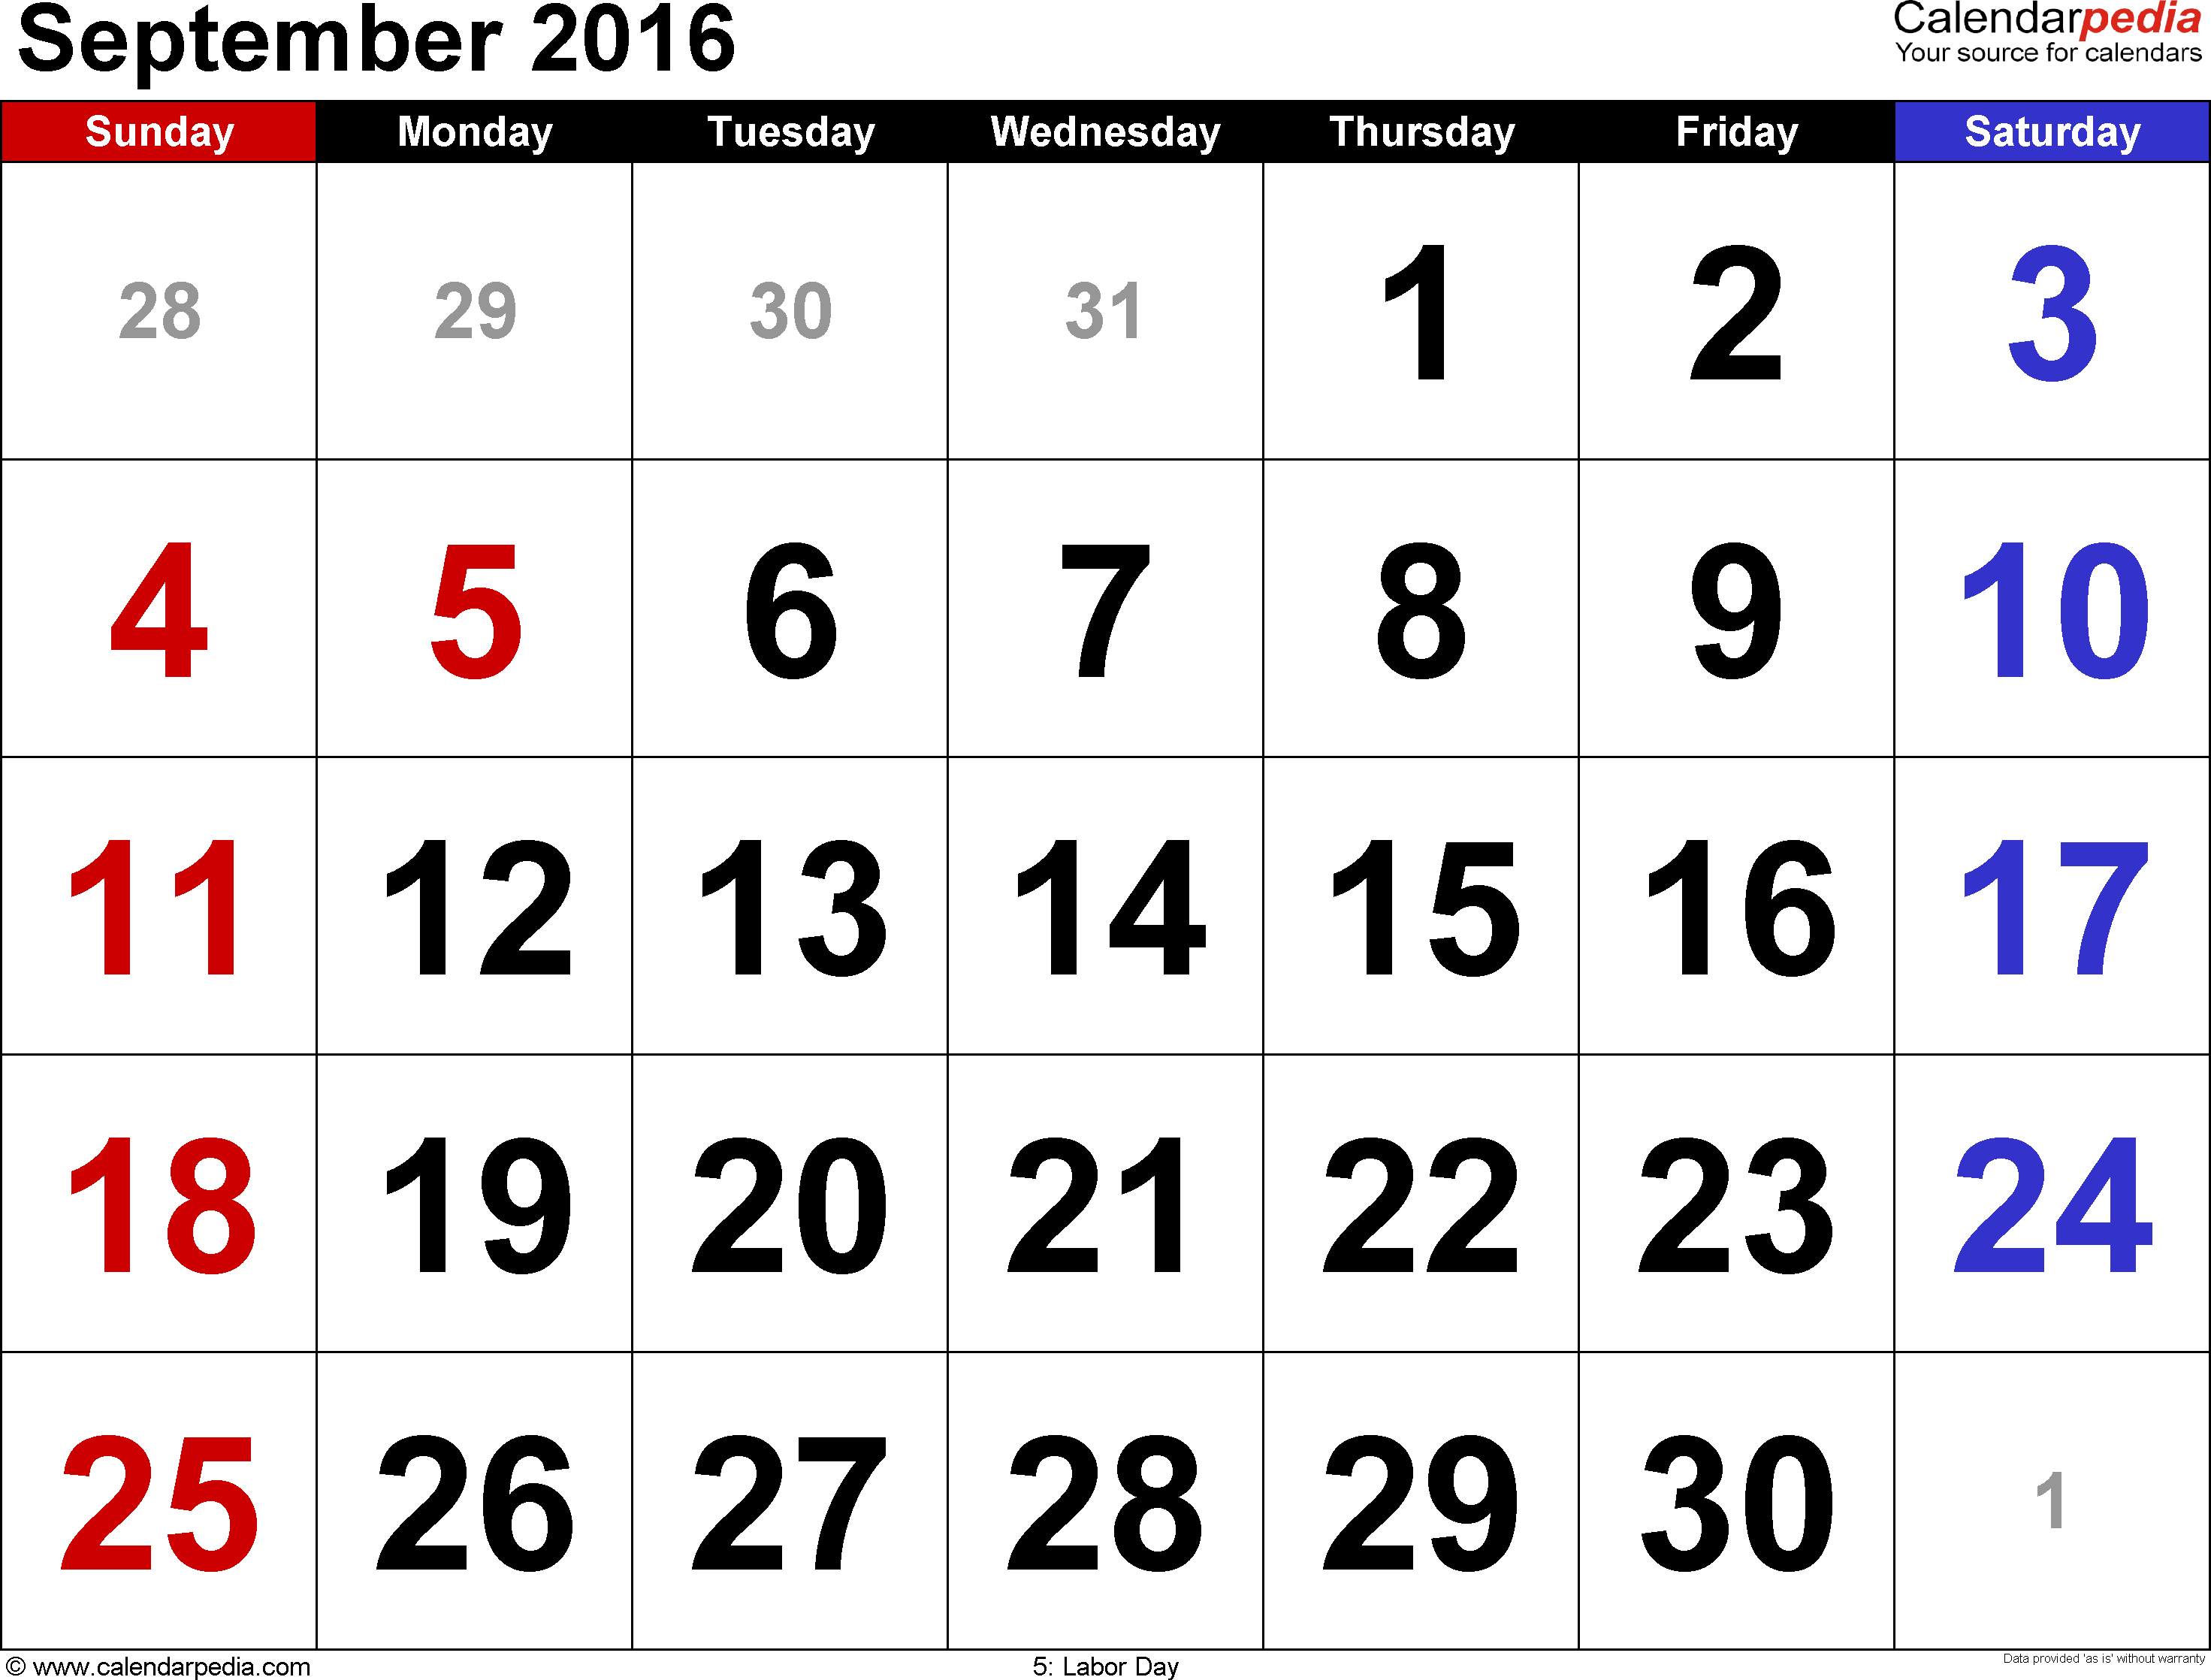 September 2016 Calendars for Word, Excel & PDF